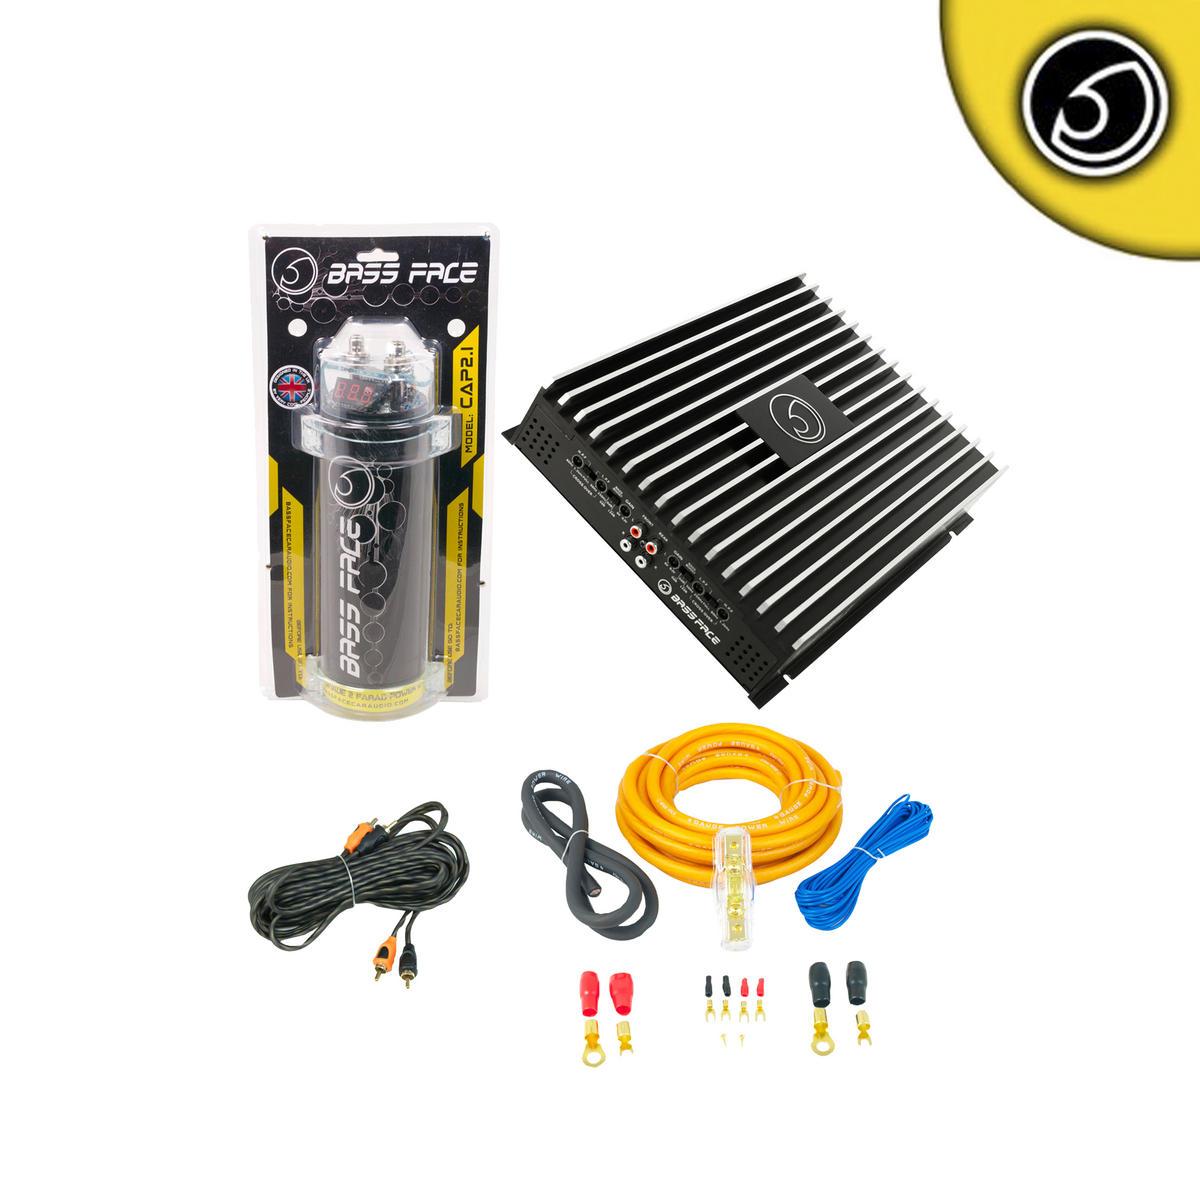 Bassface DB4.1 DB4.1 1600w Car Audio Amp Amplifier 2 Farad Power Cap Wiring Kit